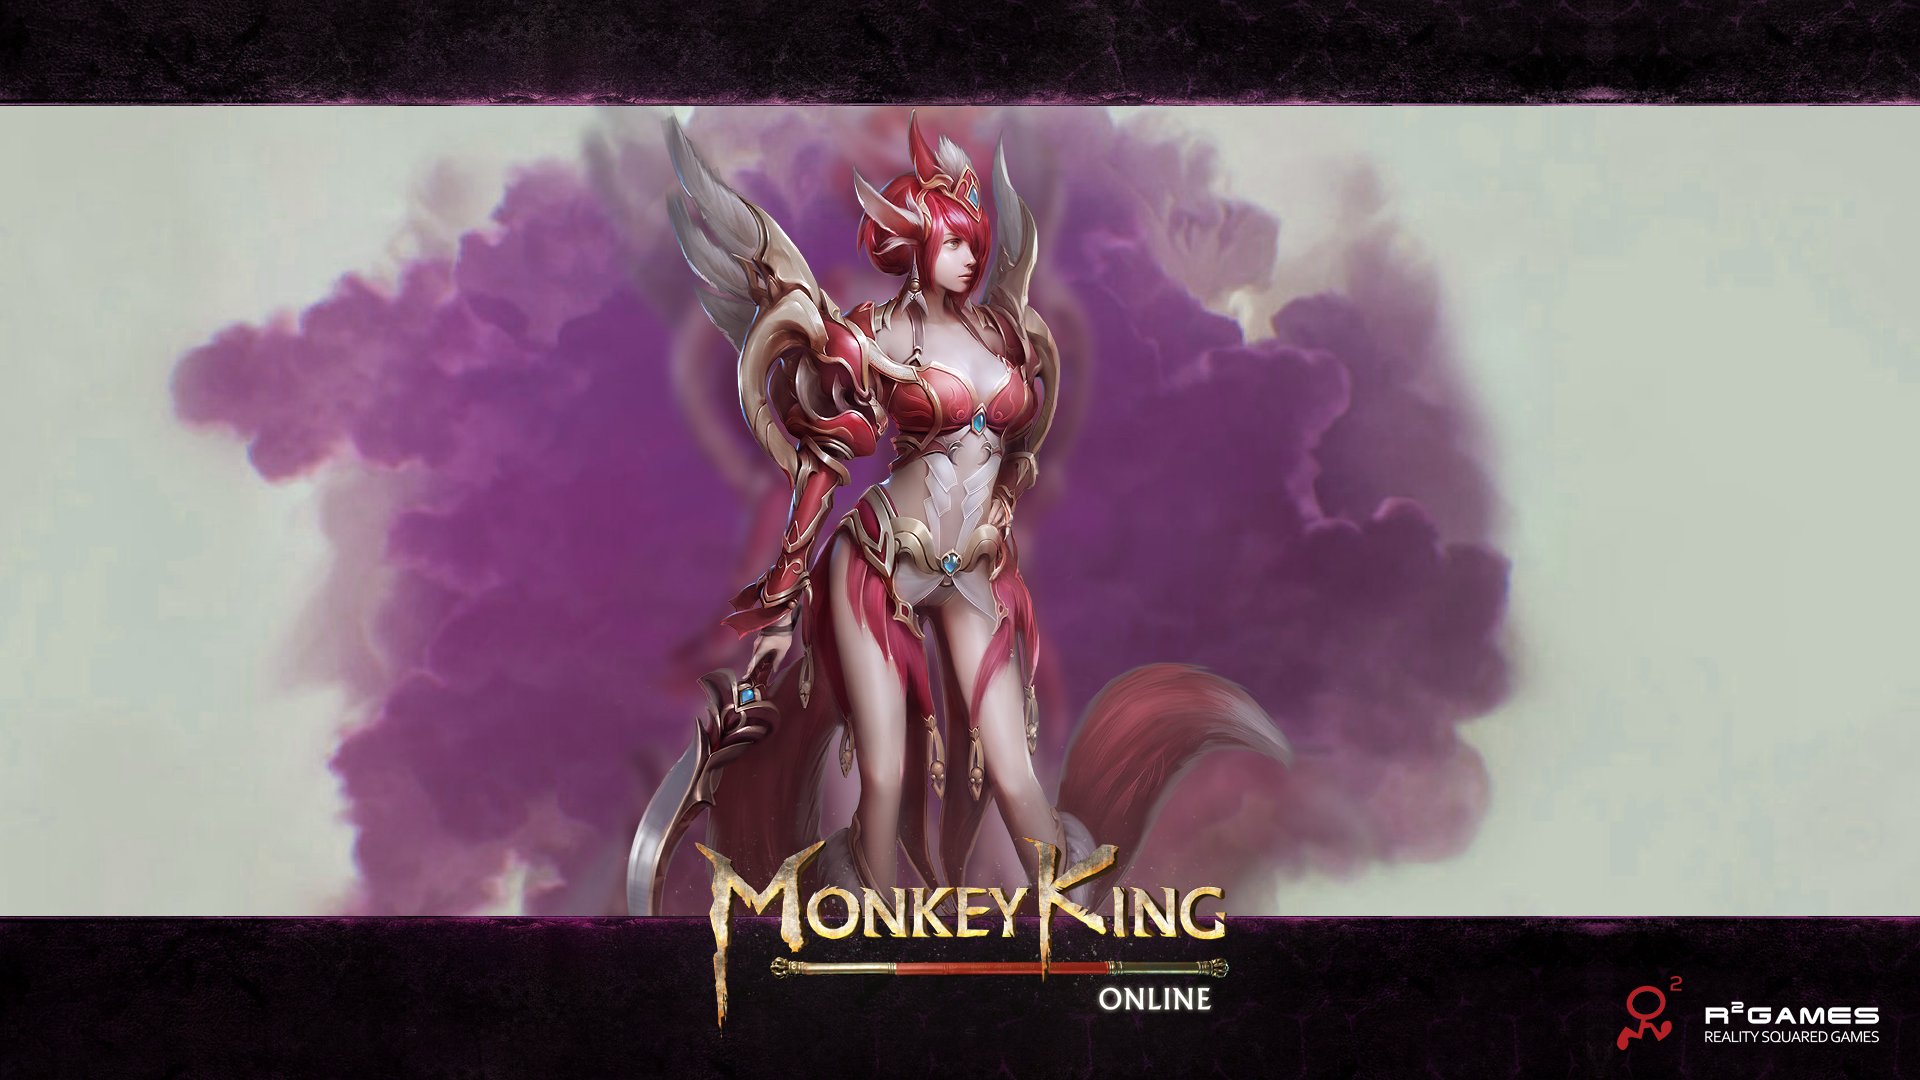 [monkey]_wallpaper2.jpg